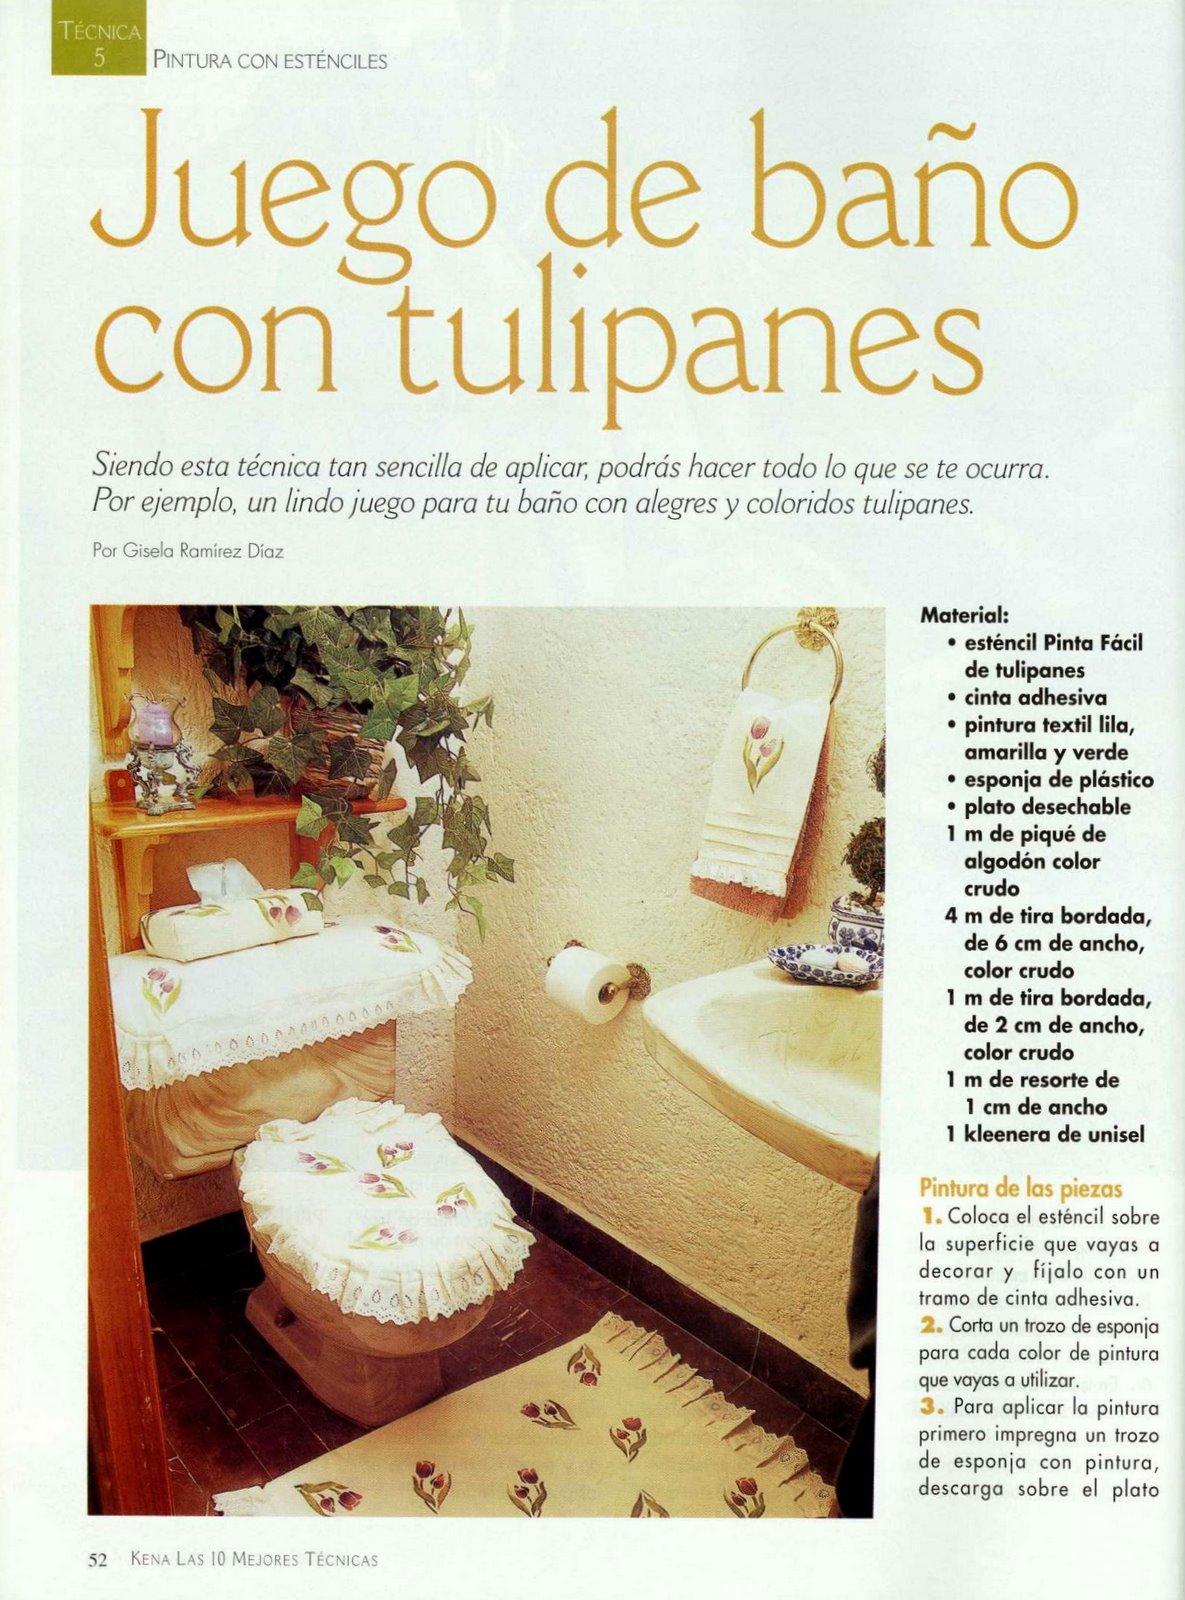 Juegos De Baño Moldes:Moldes para Todo: = Juego de Baño con tulipanes =